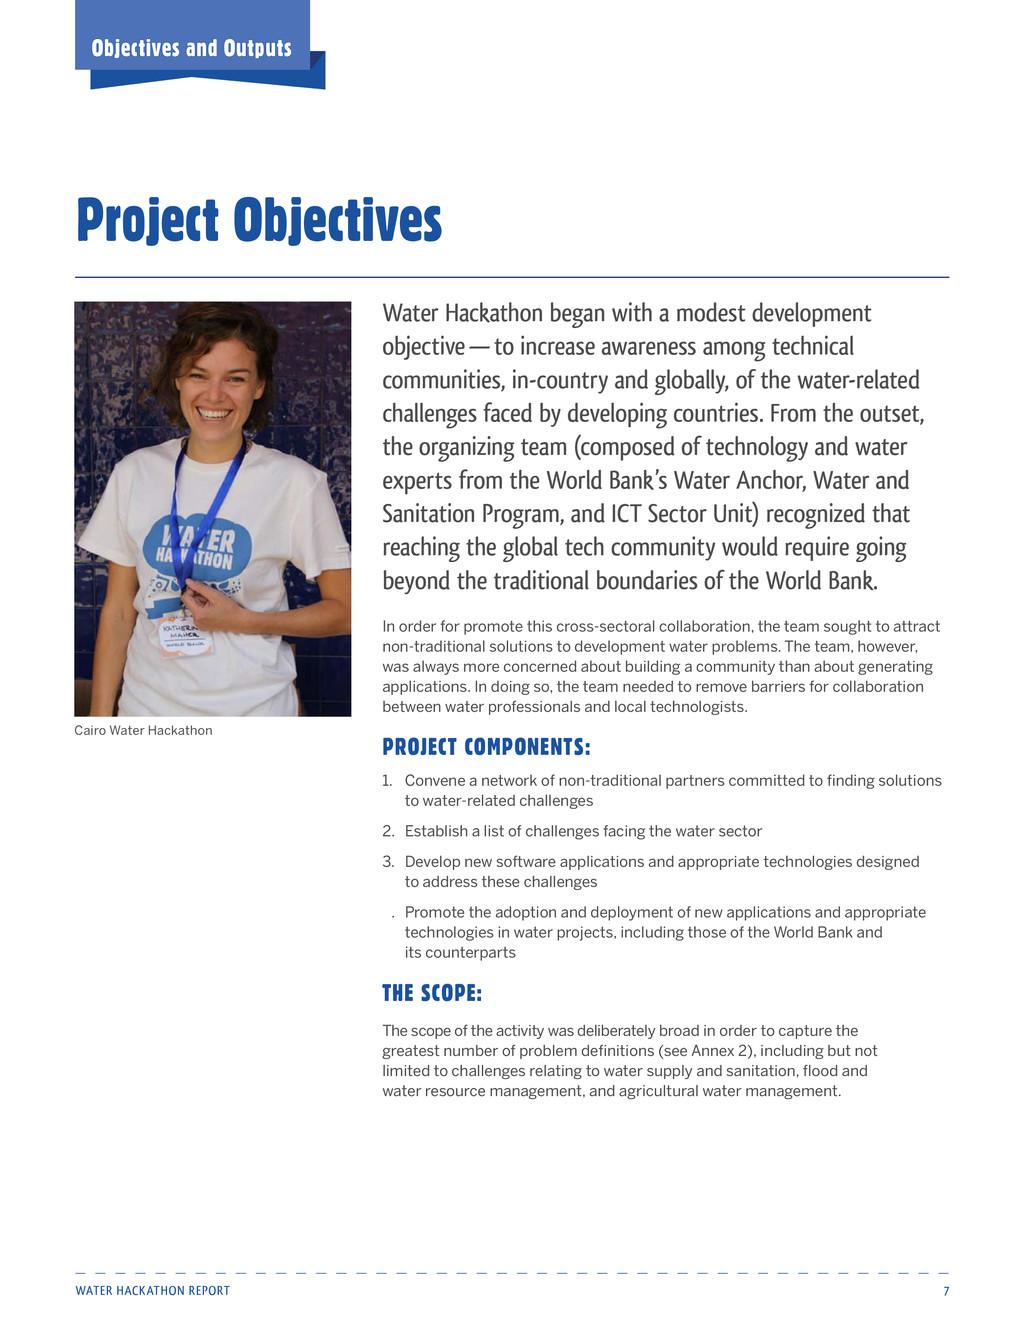 Water Hackathon Report 7 Water Hackathon began ...